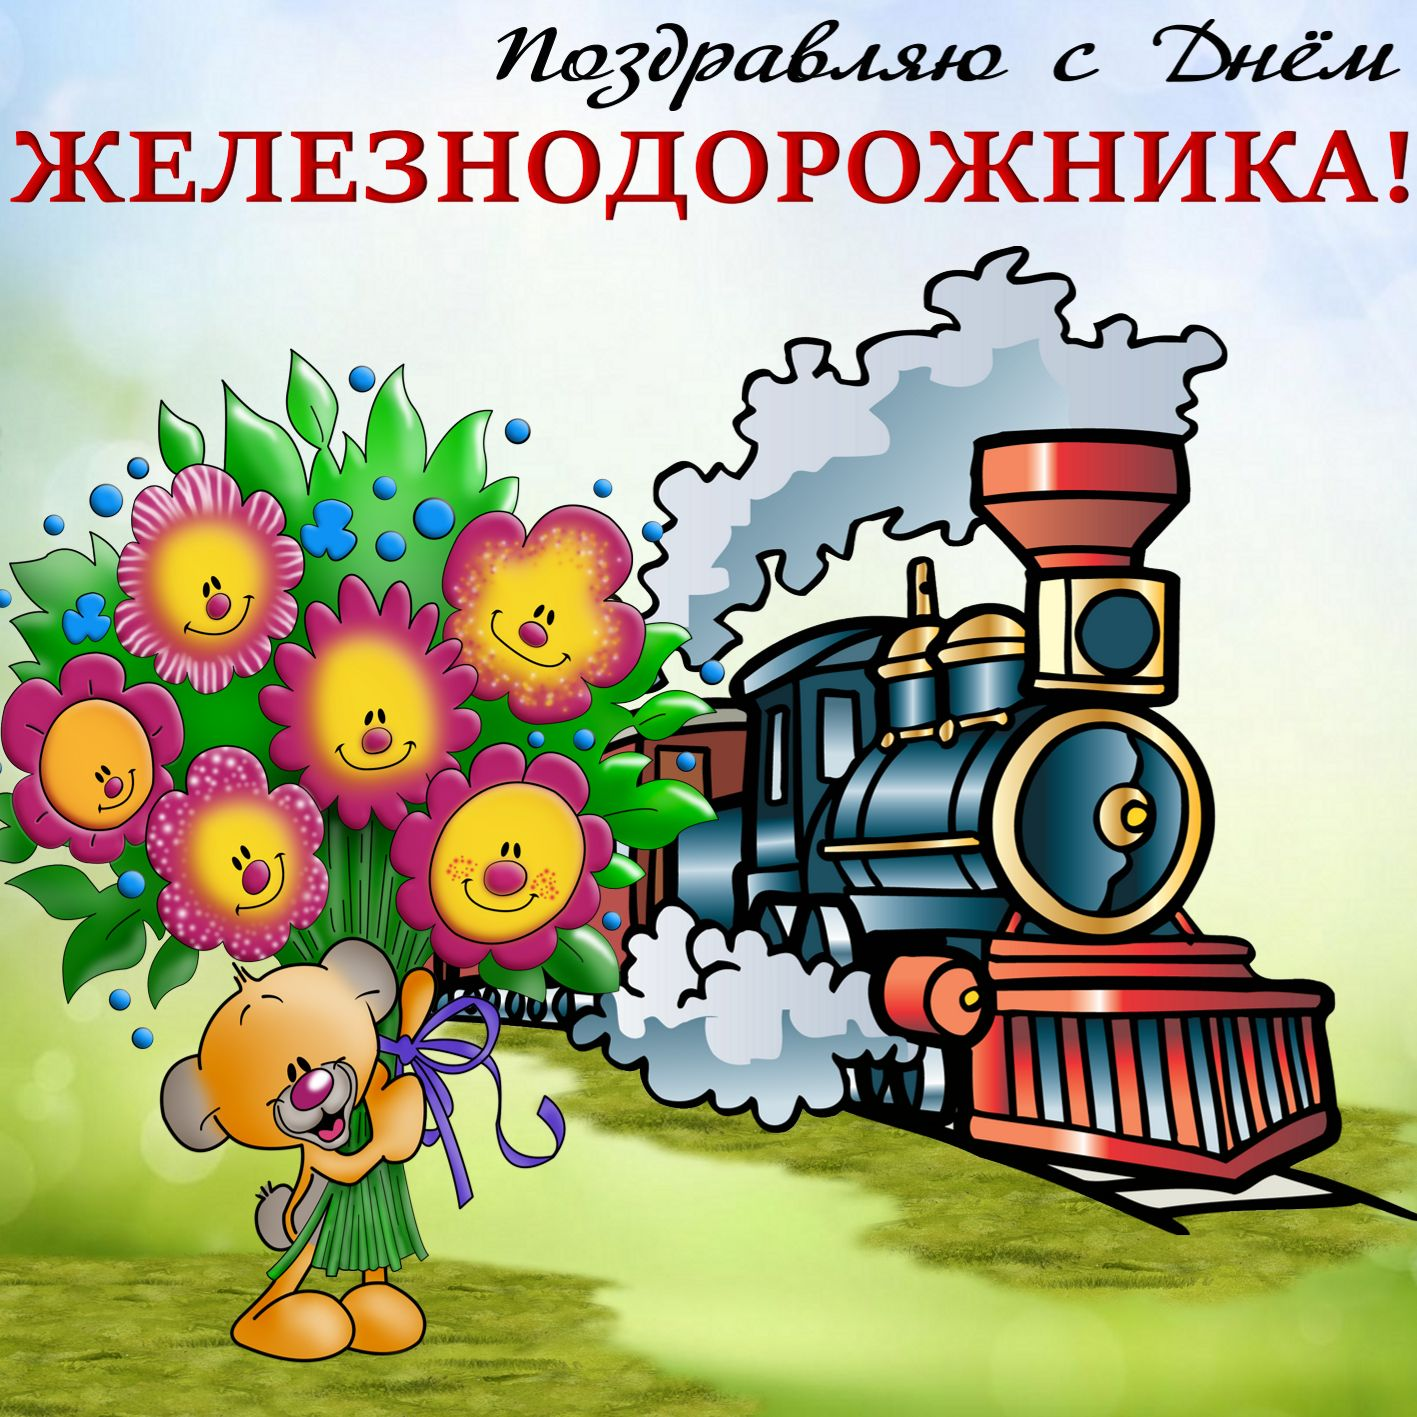 Картинки живые, анимашки ко дню железнодорожника